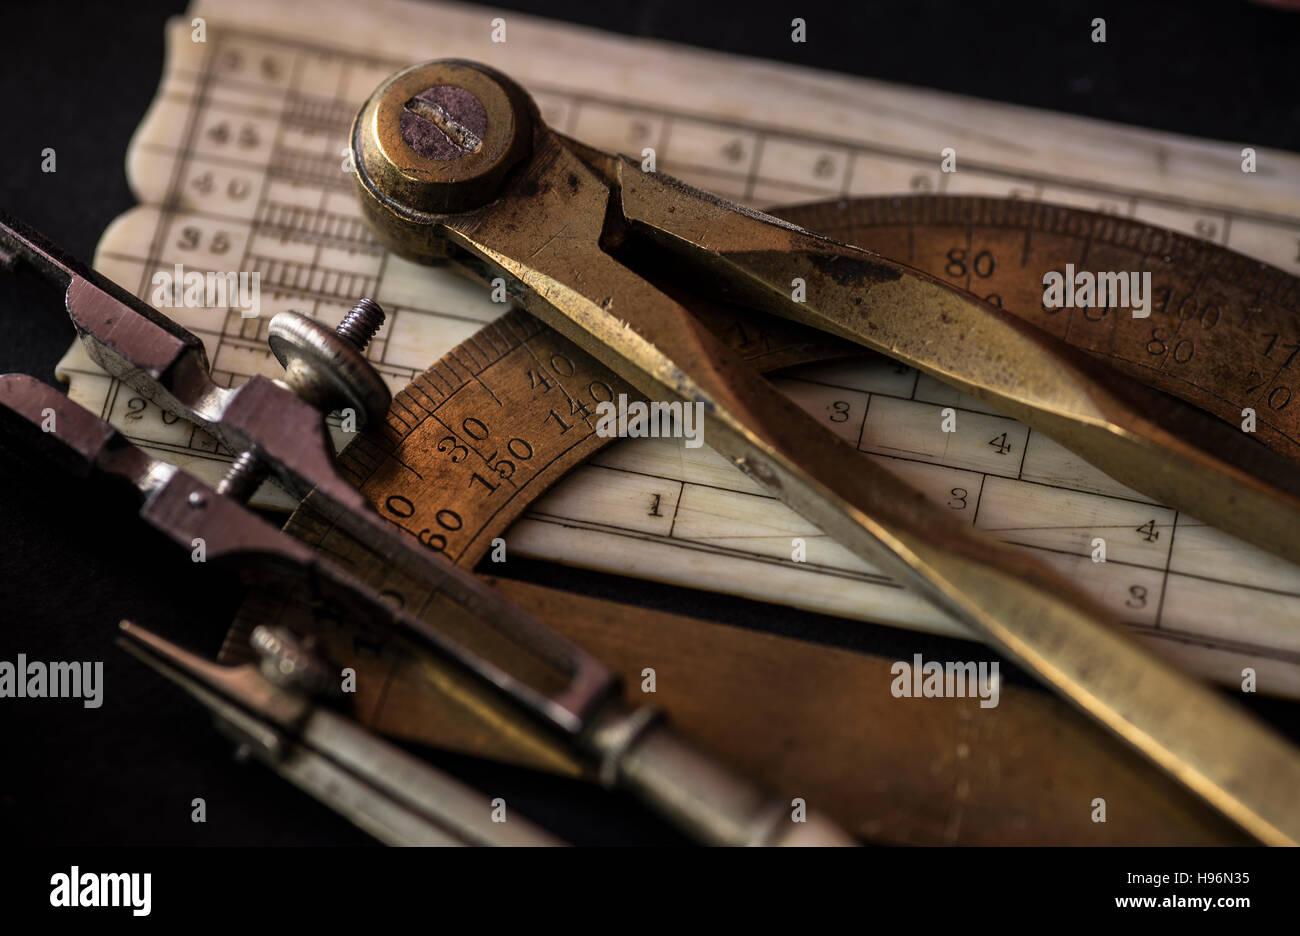 Studio shot of antique instruments of measurement - Stock Image